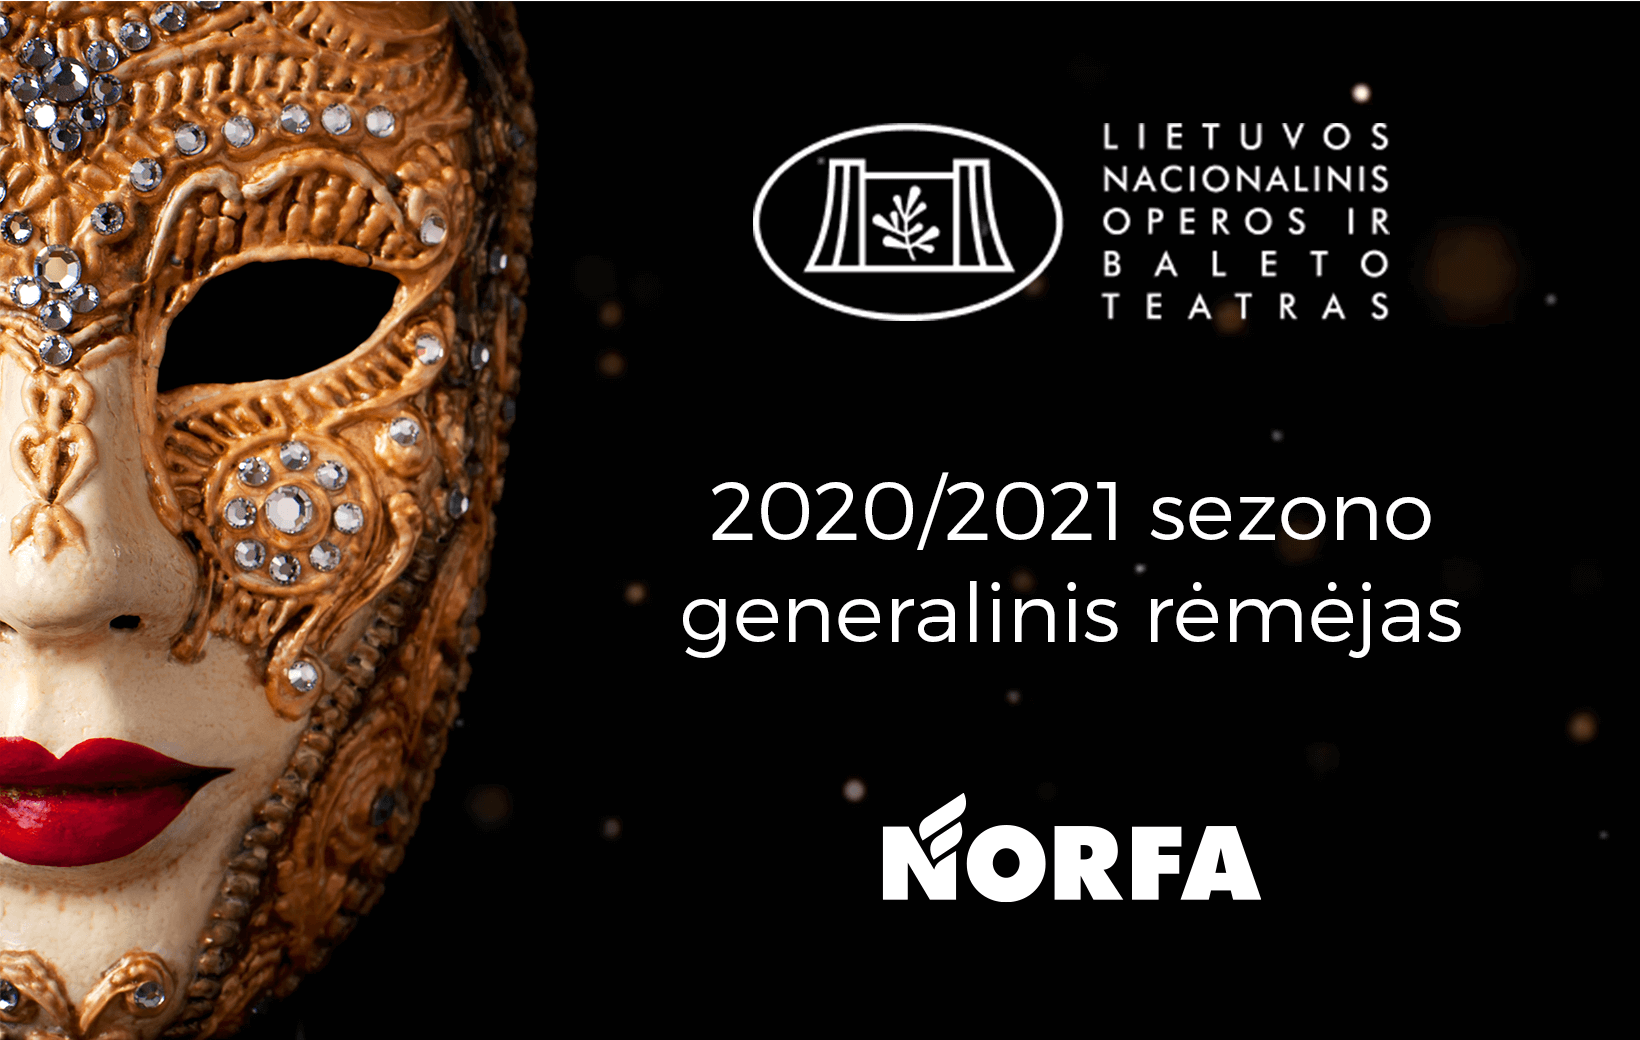 Operai 100 Norfa 1640x1040 v3